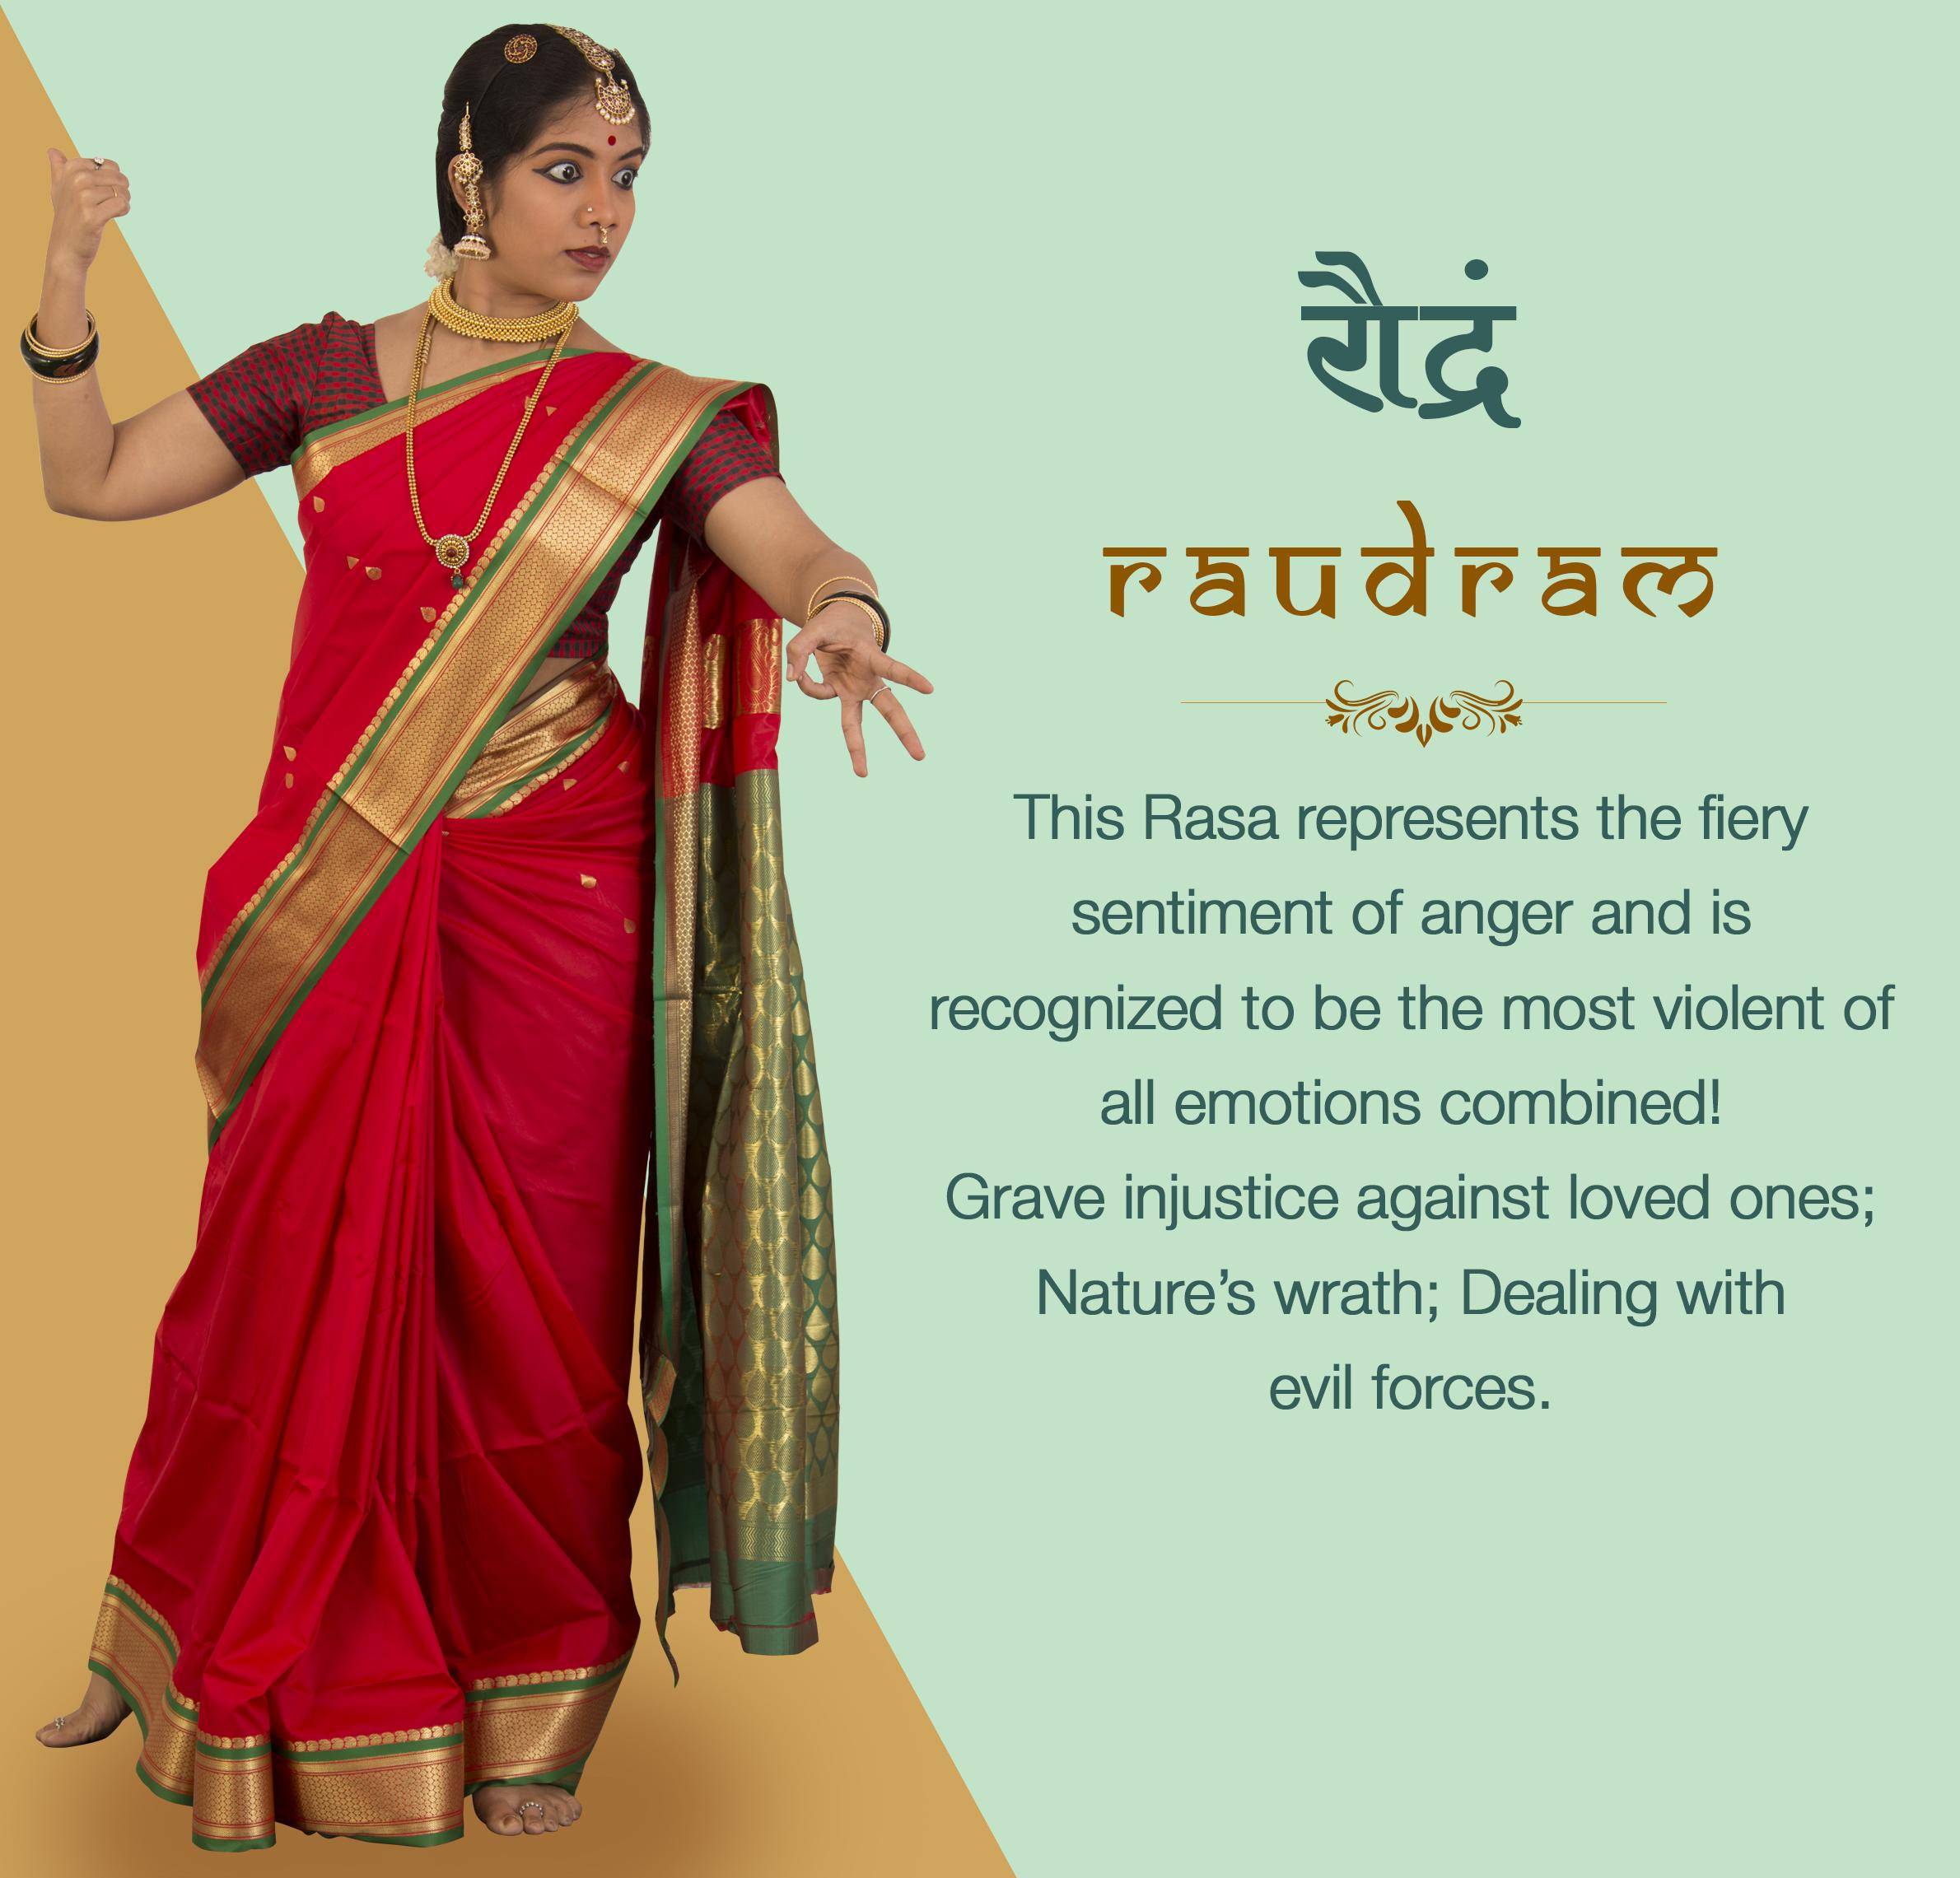 Raudram